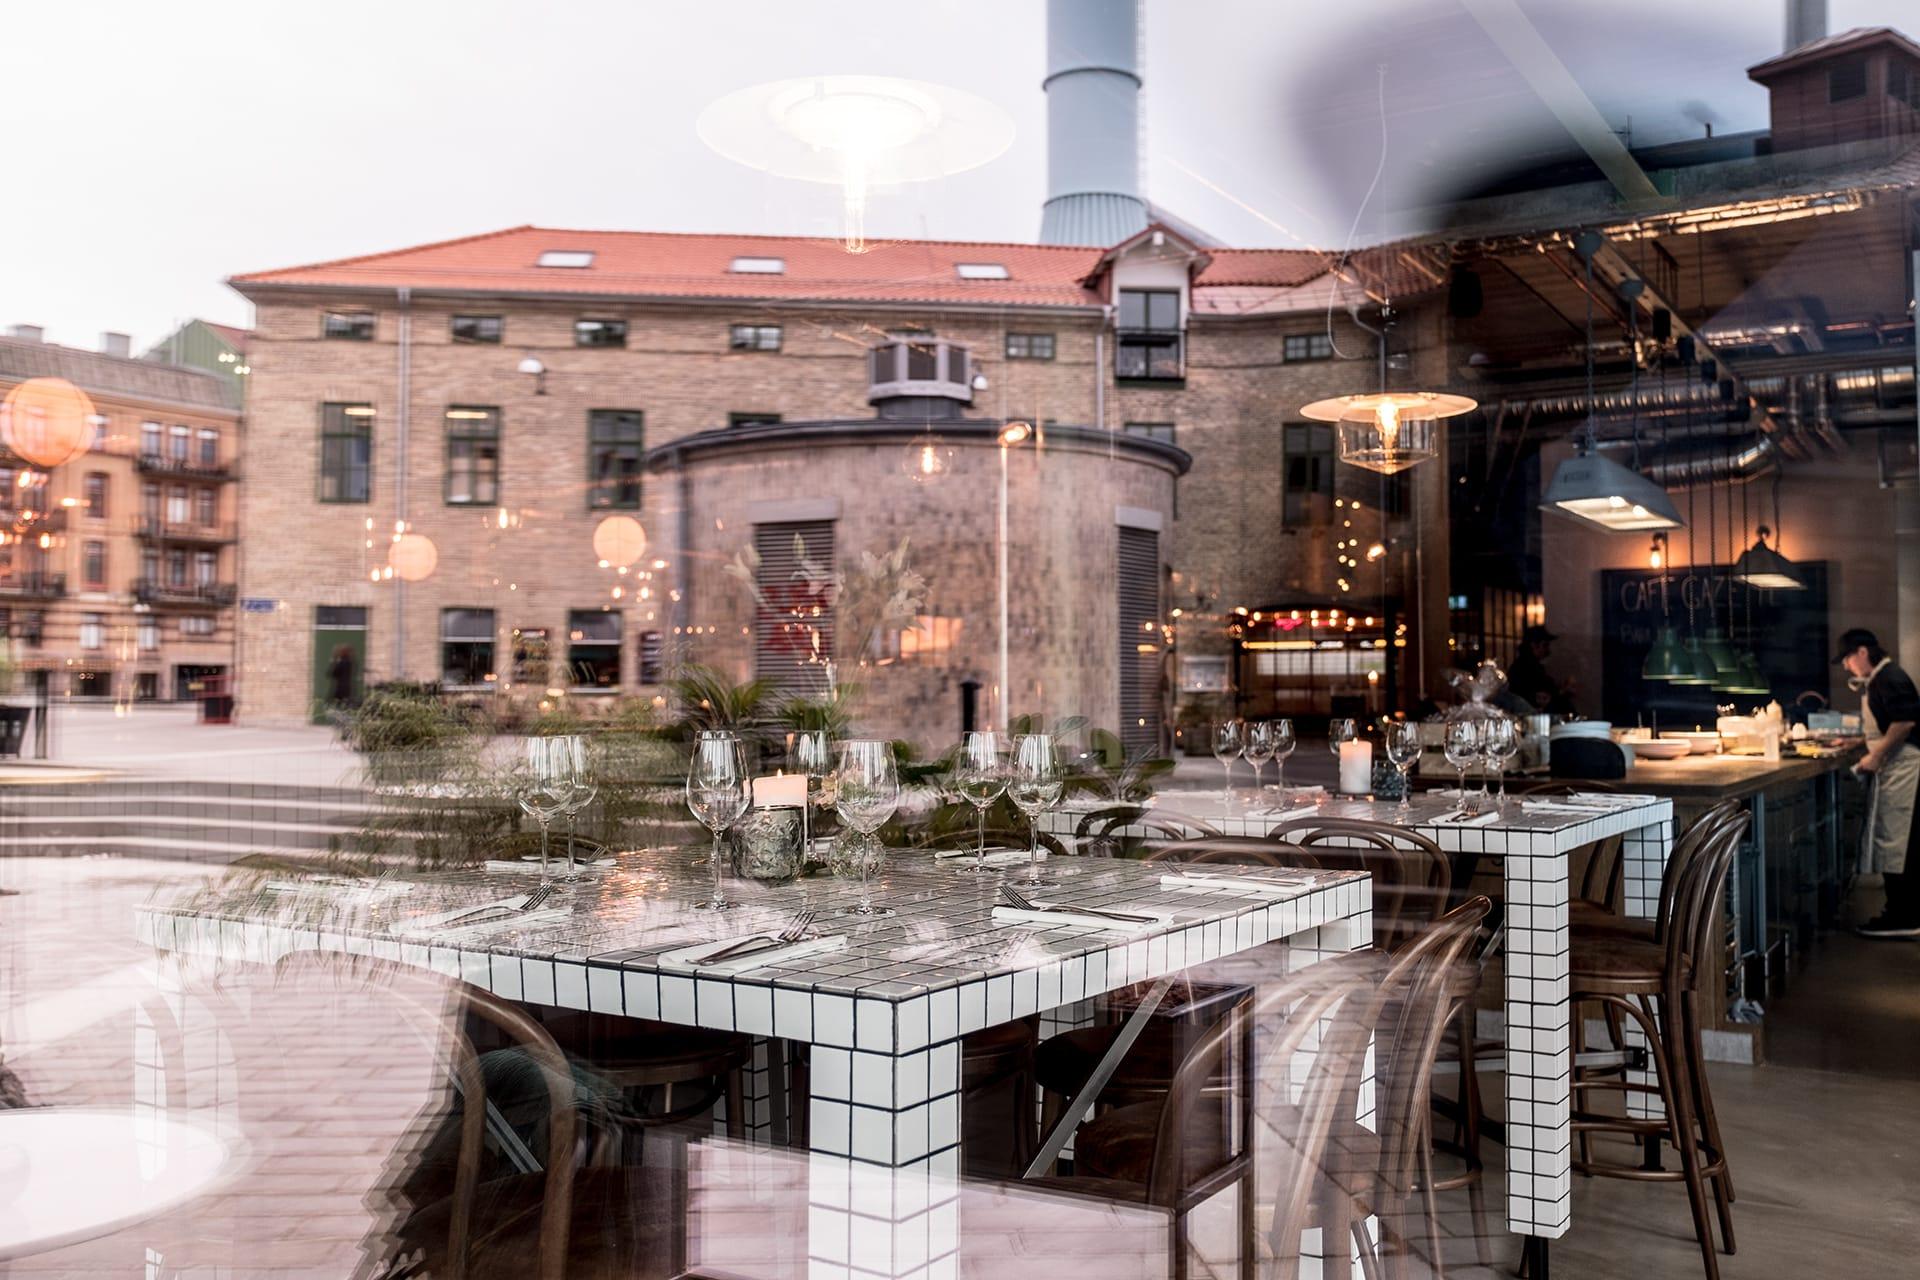 Zamenhof_Cafe_Gazette_Interior_Fotografi_mnecander-10